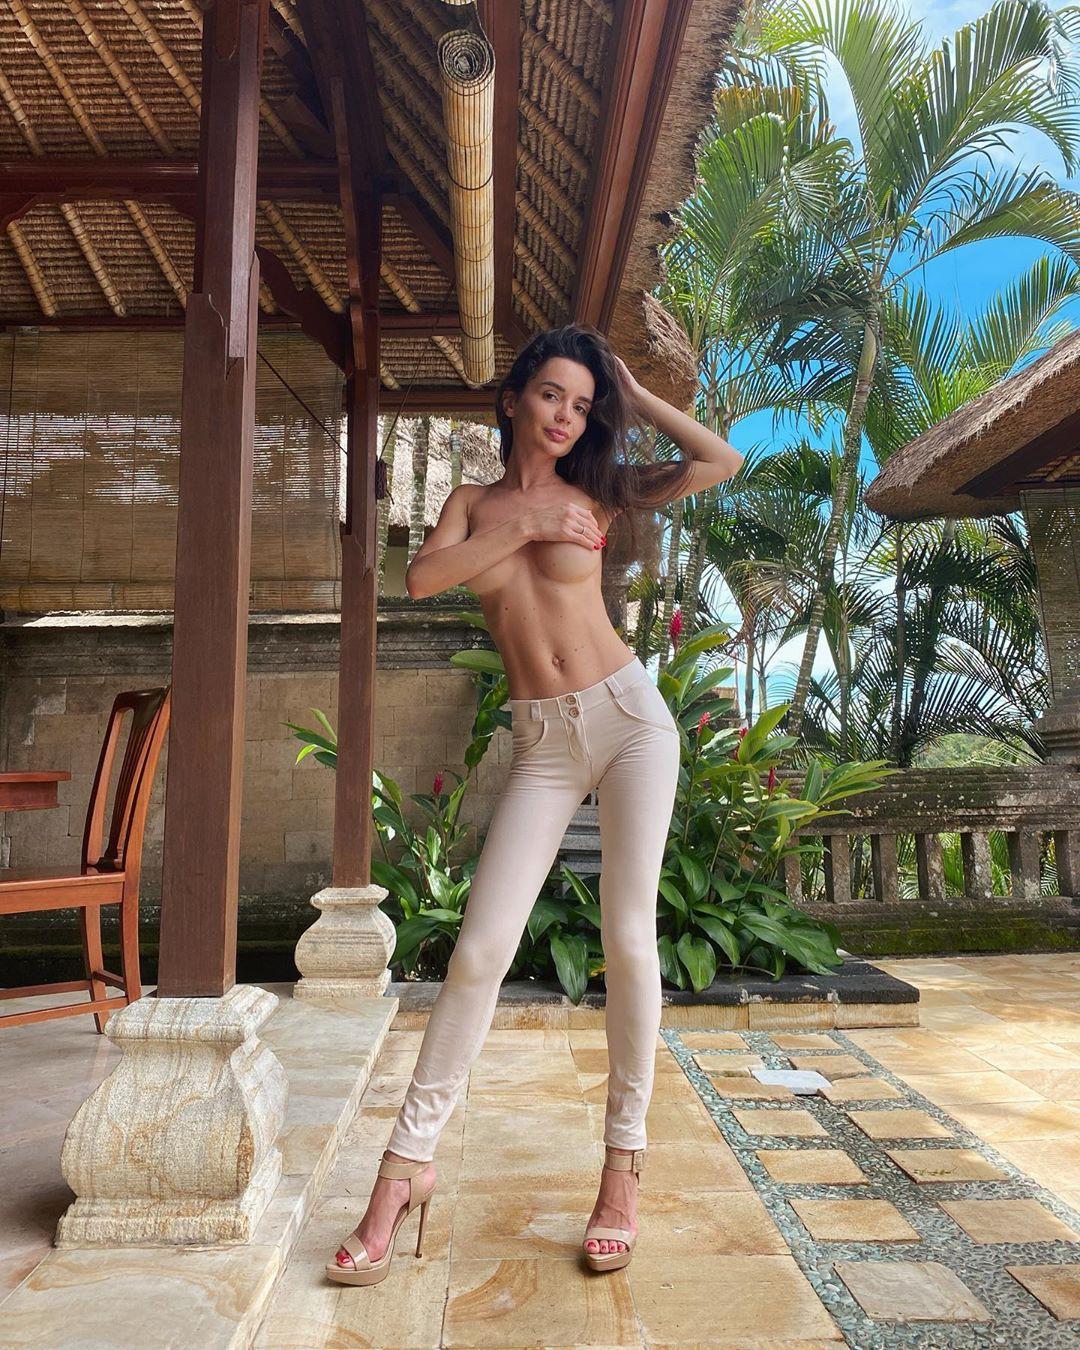 Ekaterina Zueva best photoshoot ideas, girls instgram photography, legs photo